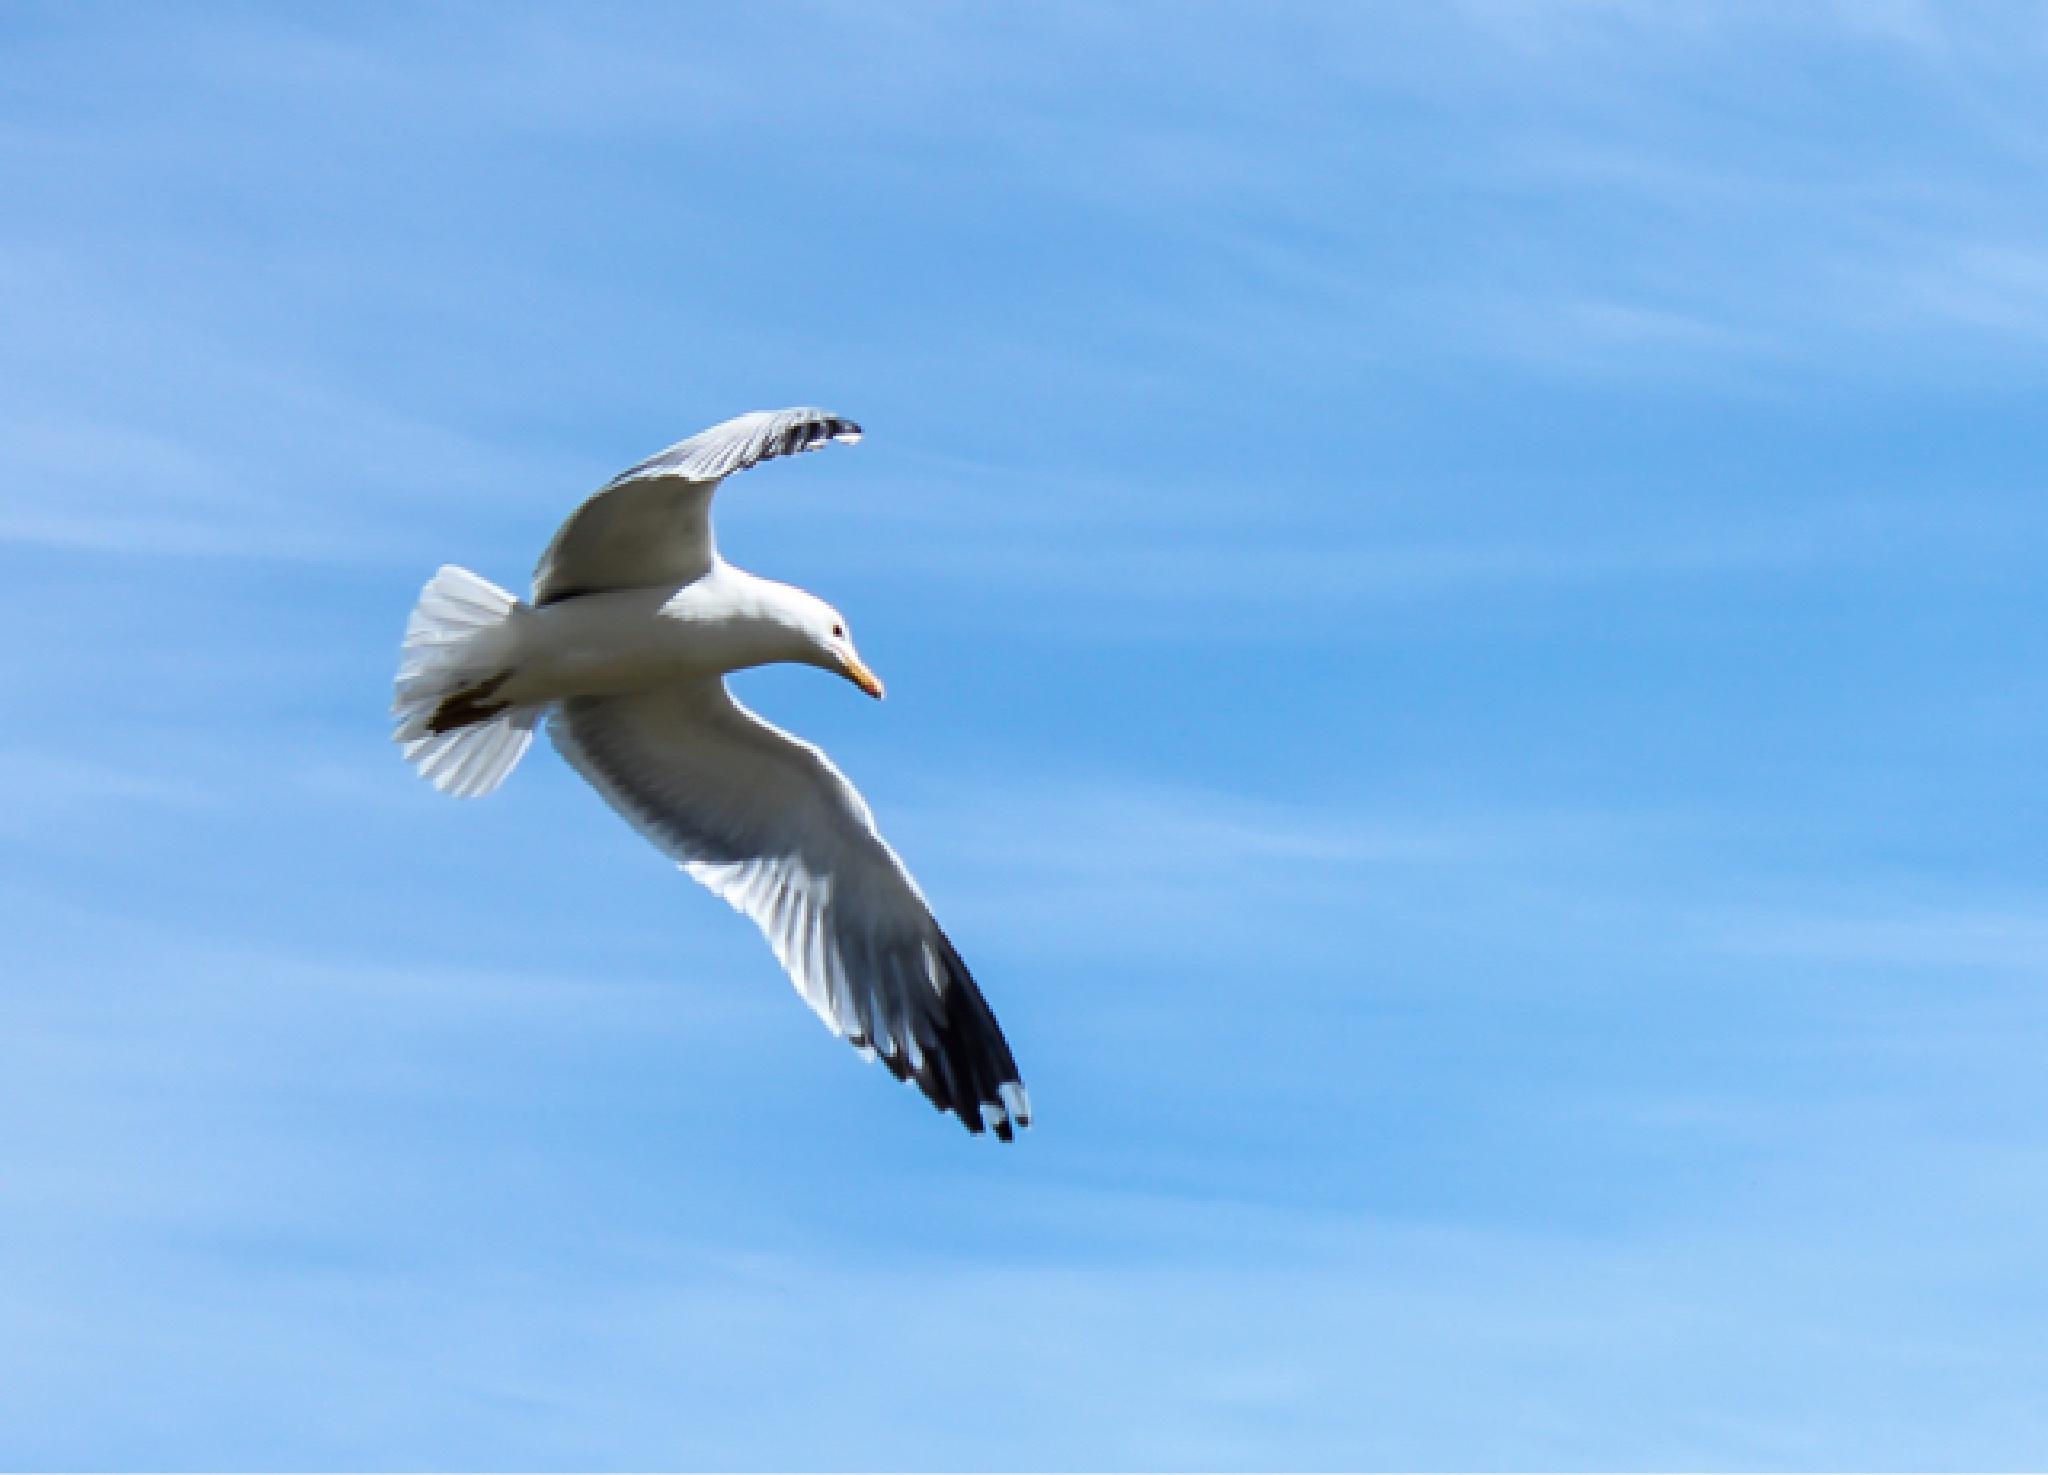 Seagull 2 by shaunarwhitaker